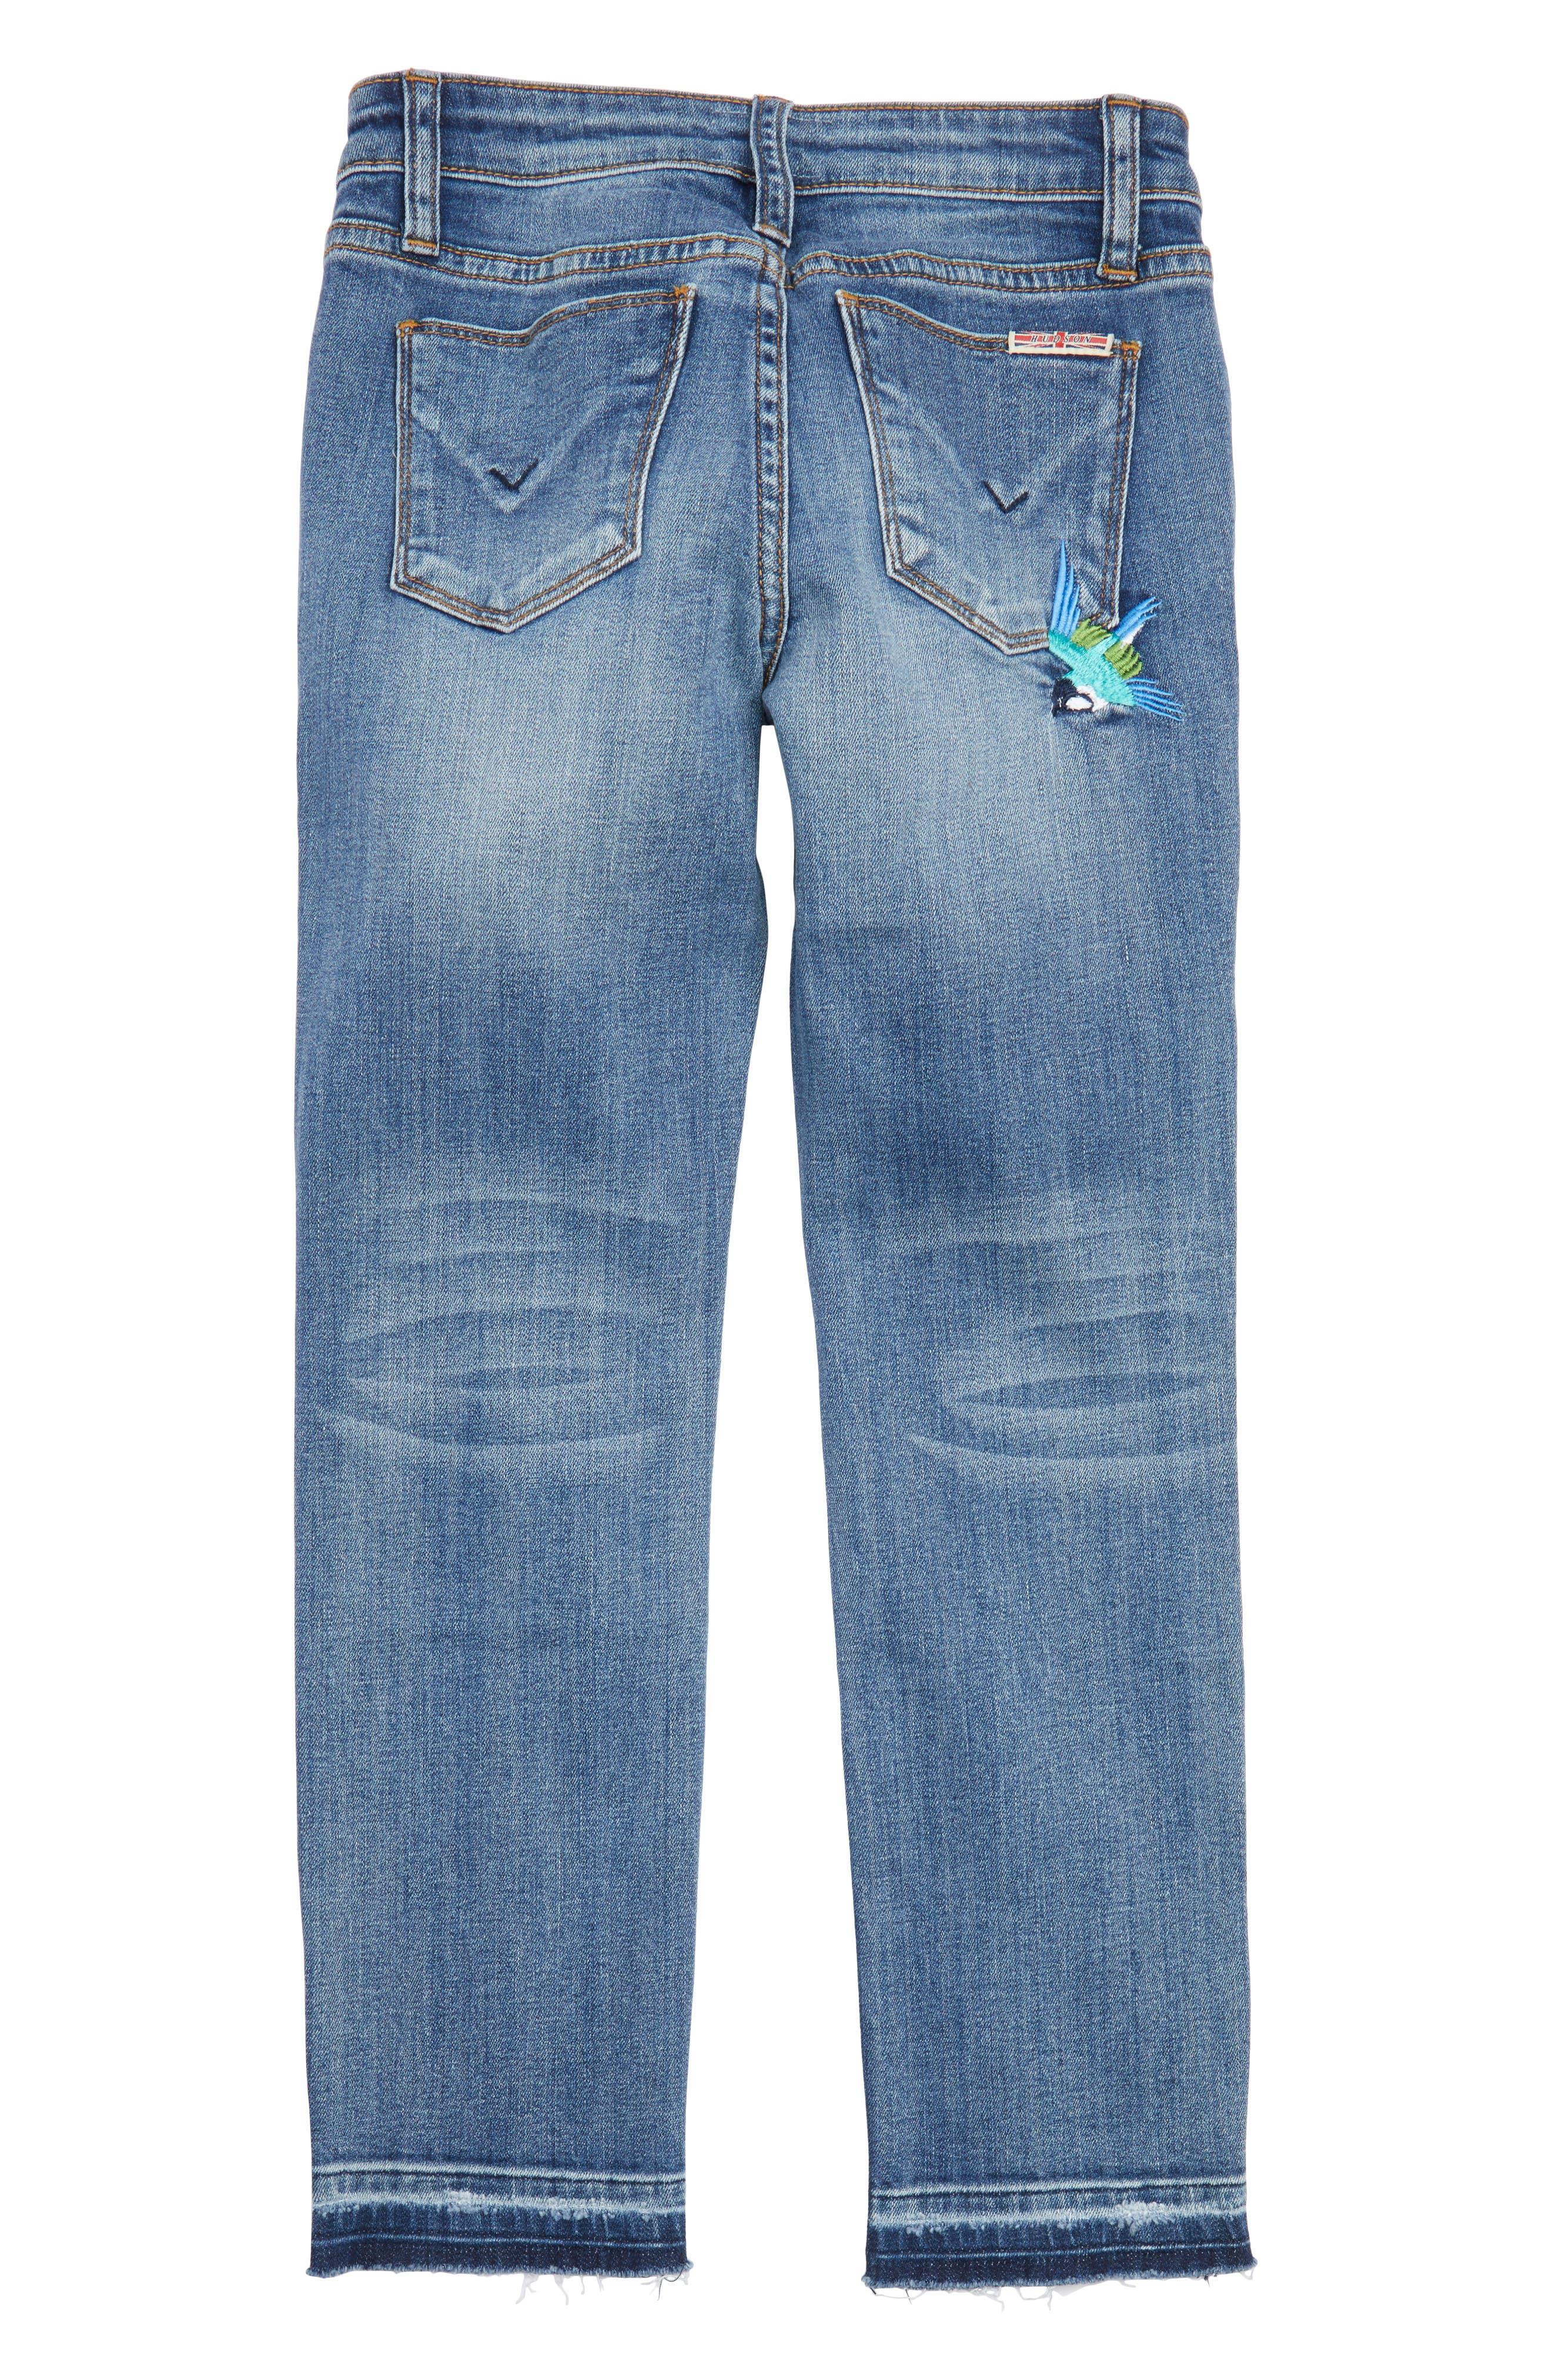 Freebird Girlfriend Jeans,                             Alternate thumbnail 2, color,                             Hippie Heaven